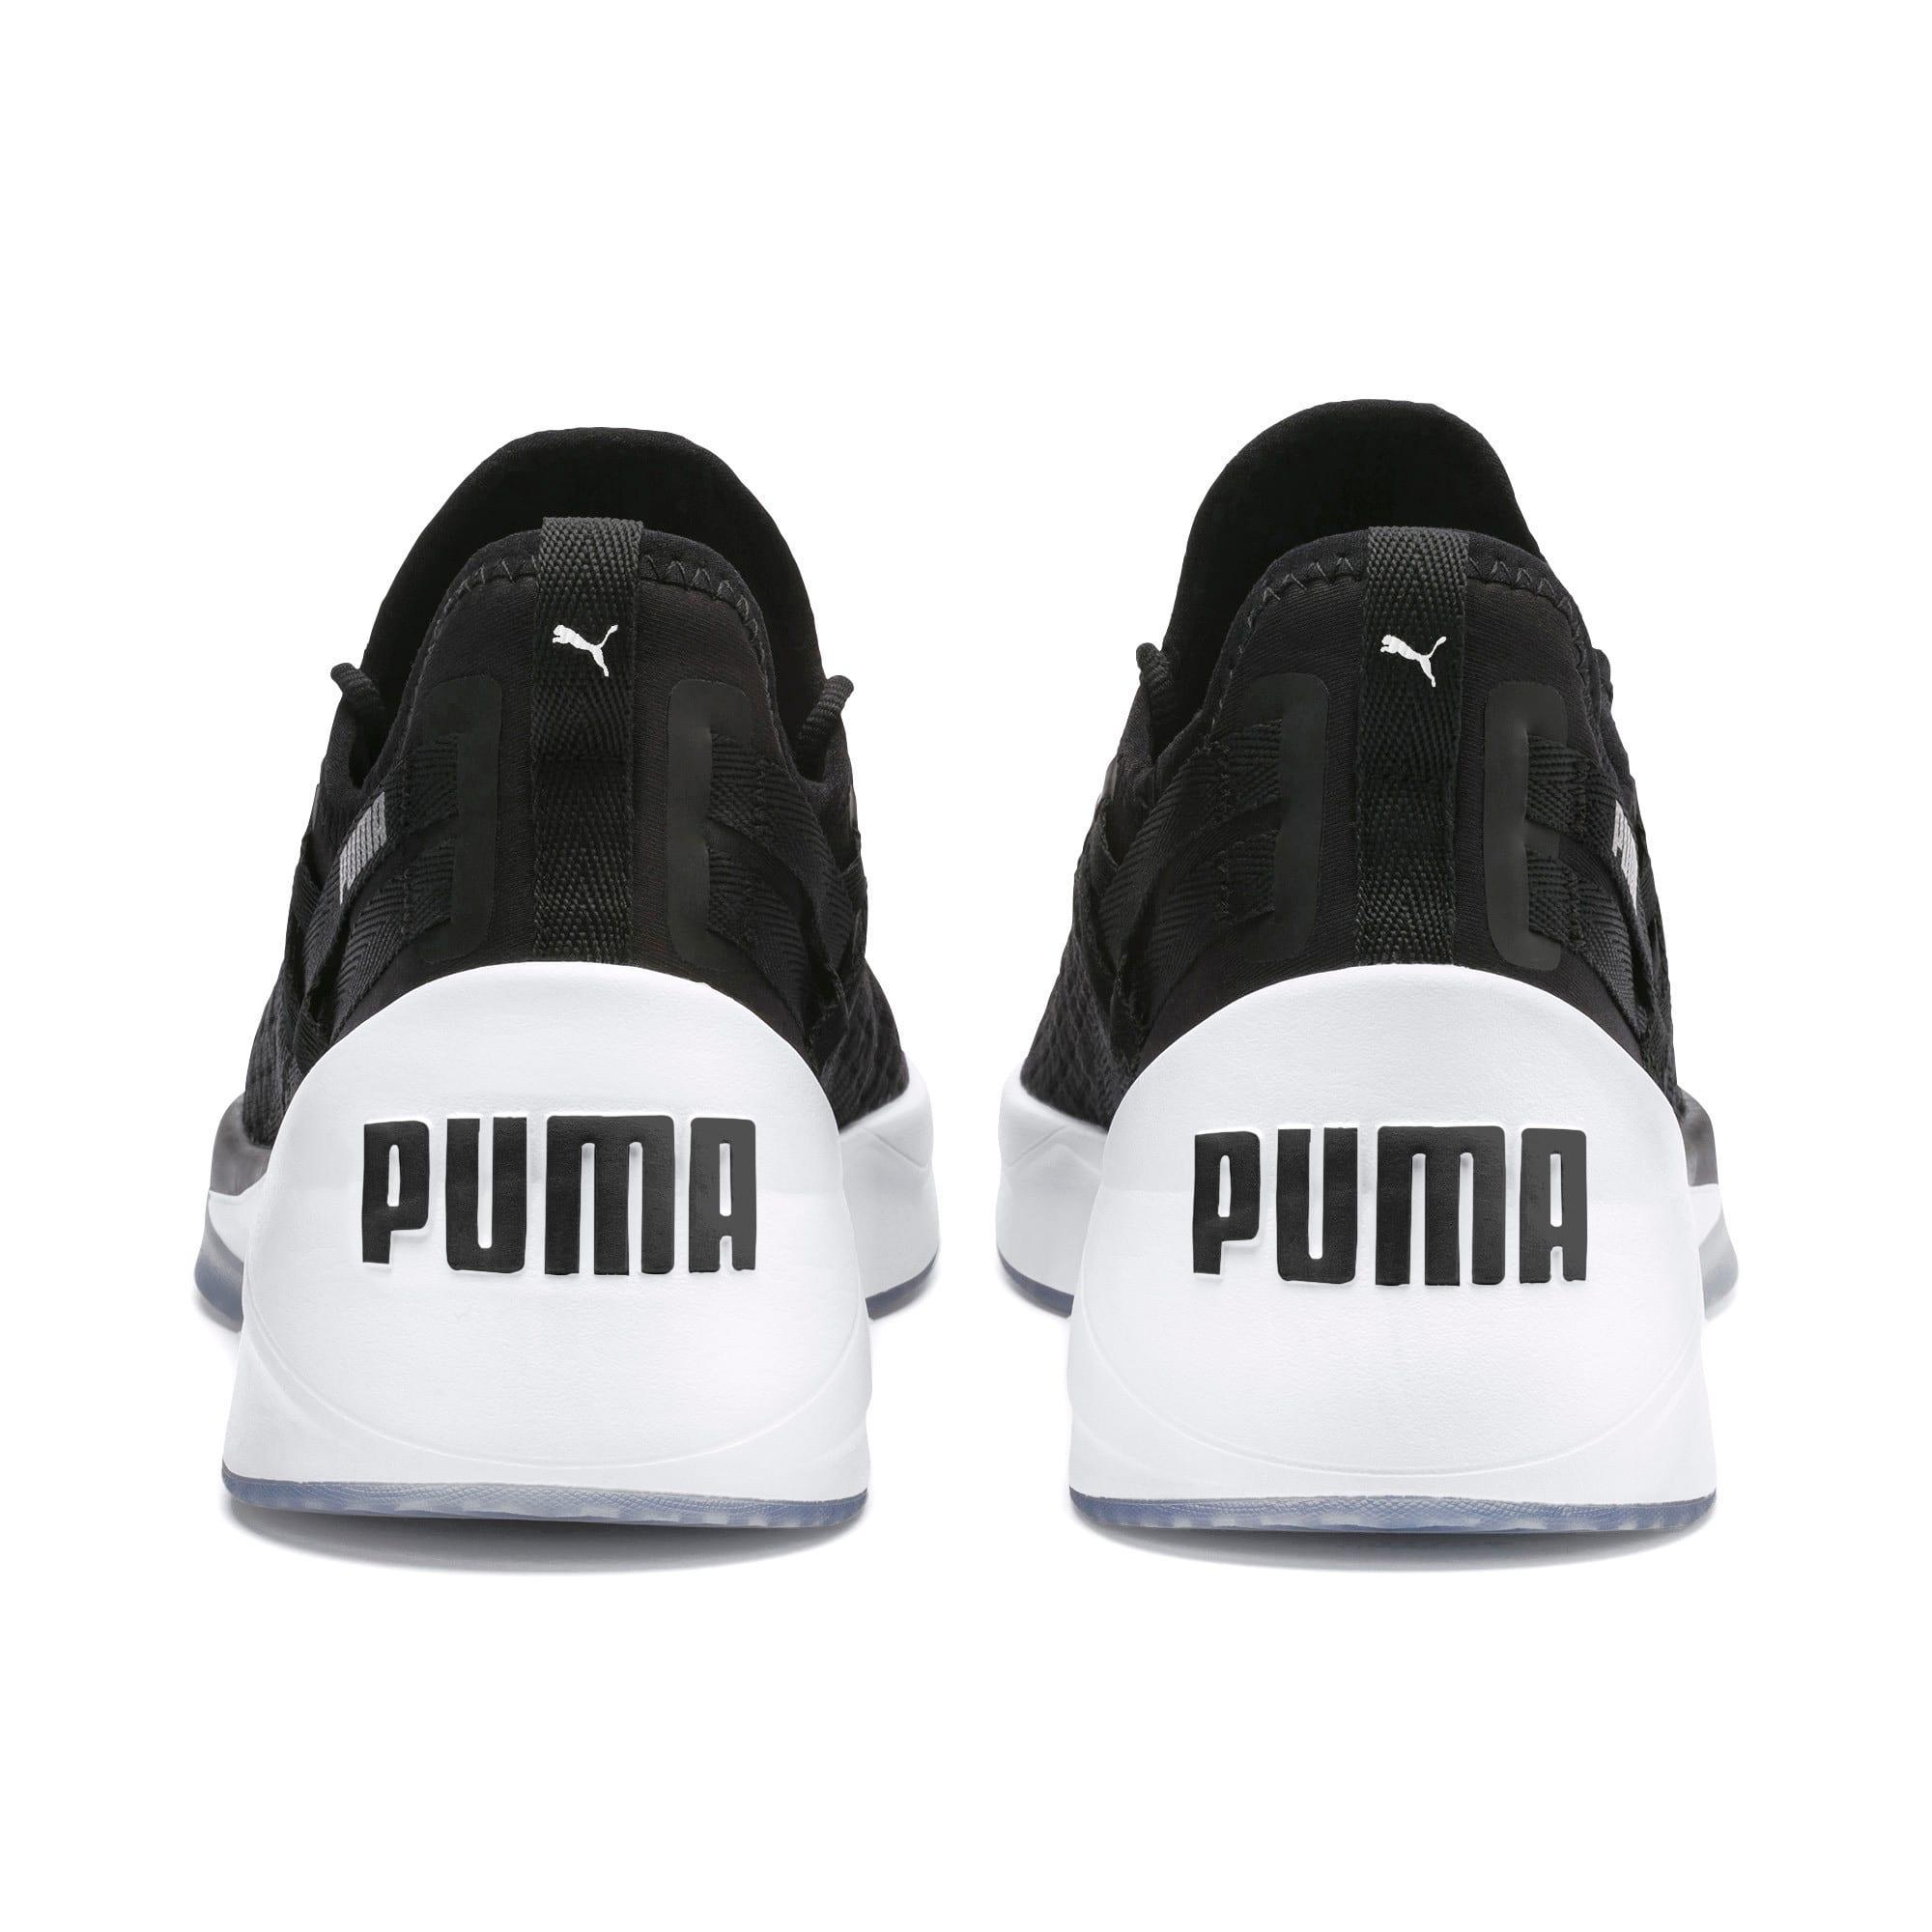 Thumbnail 3 of Jaab XT Women's Training Trainers, Puma Black-Puma White, medium